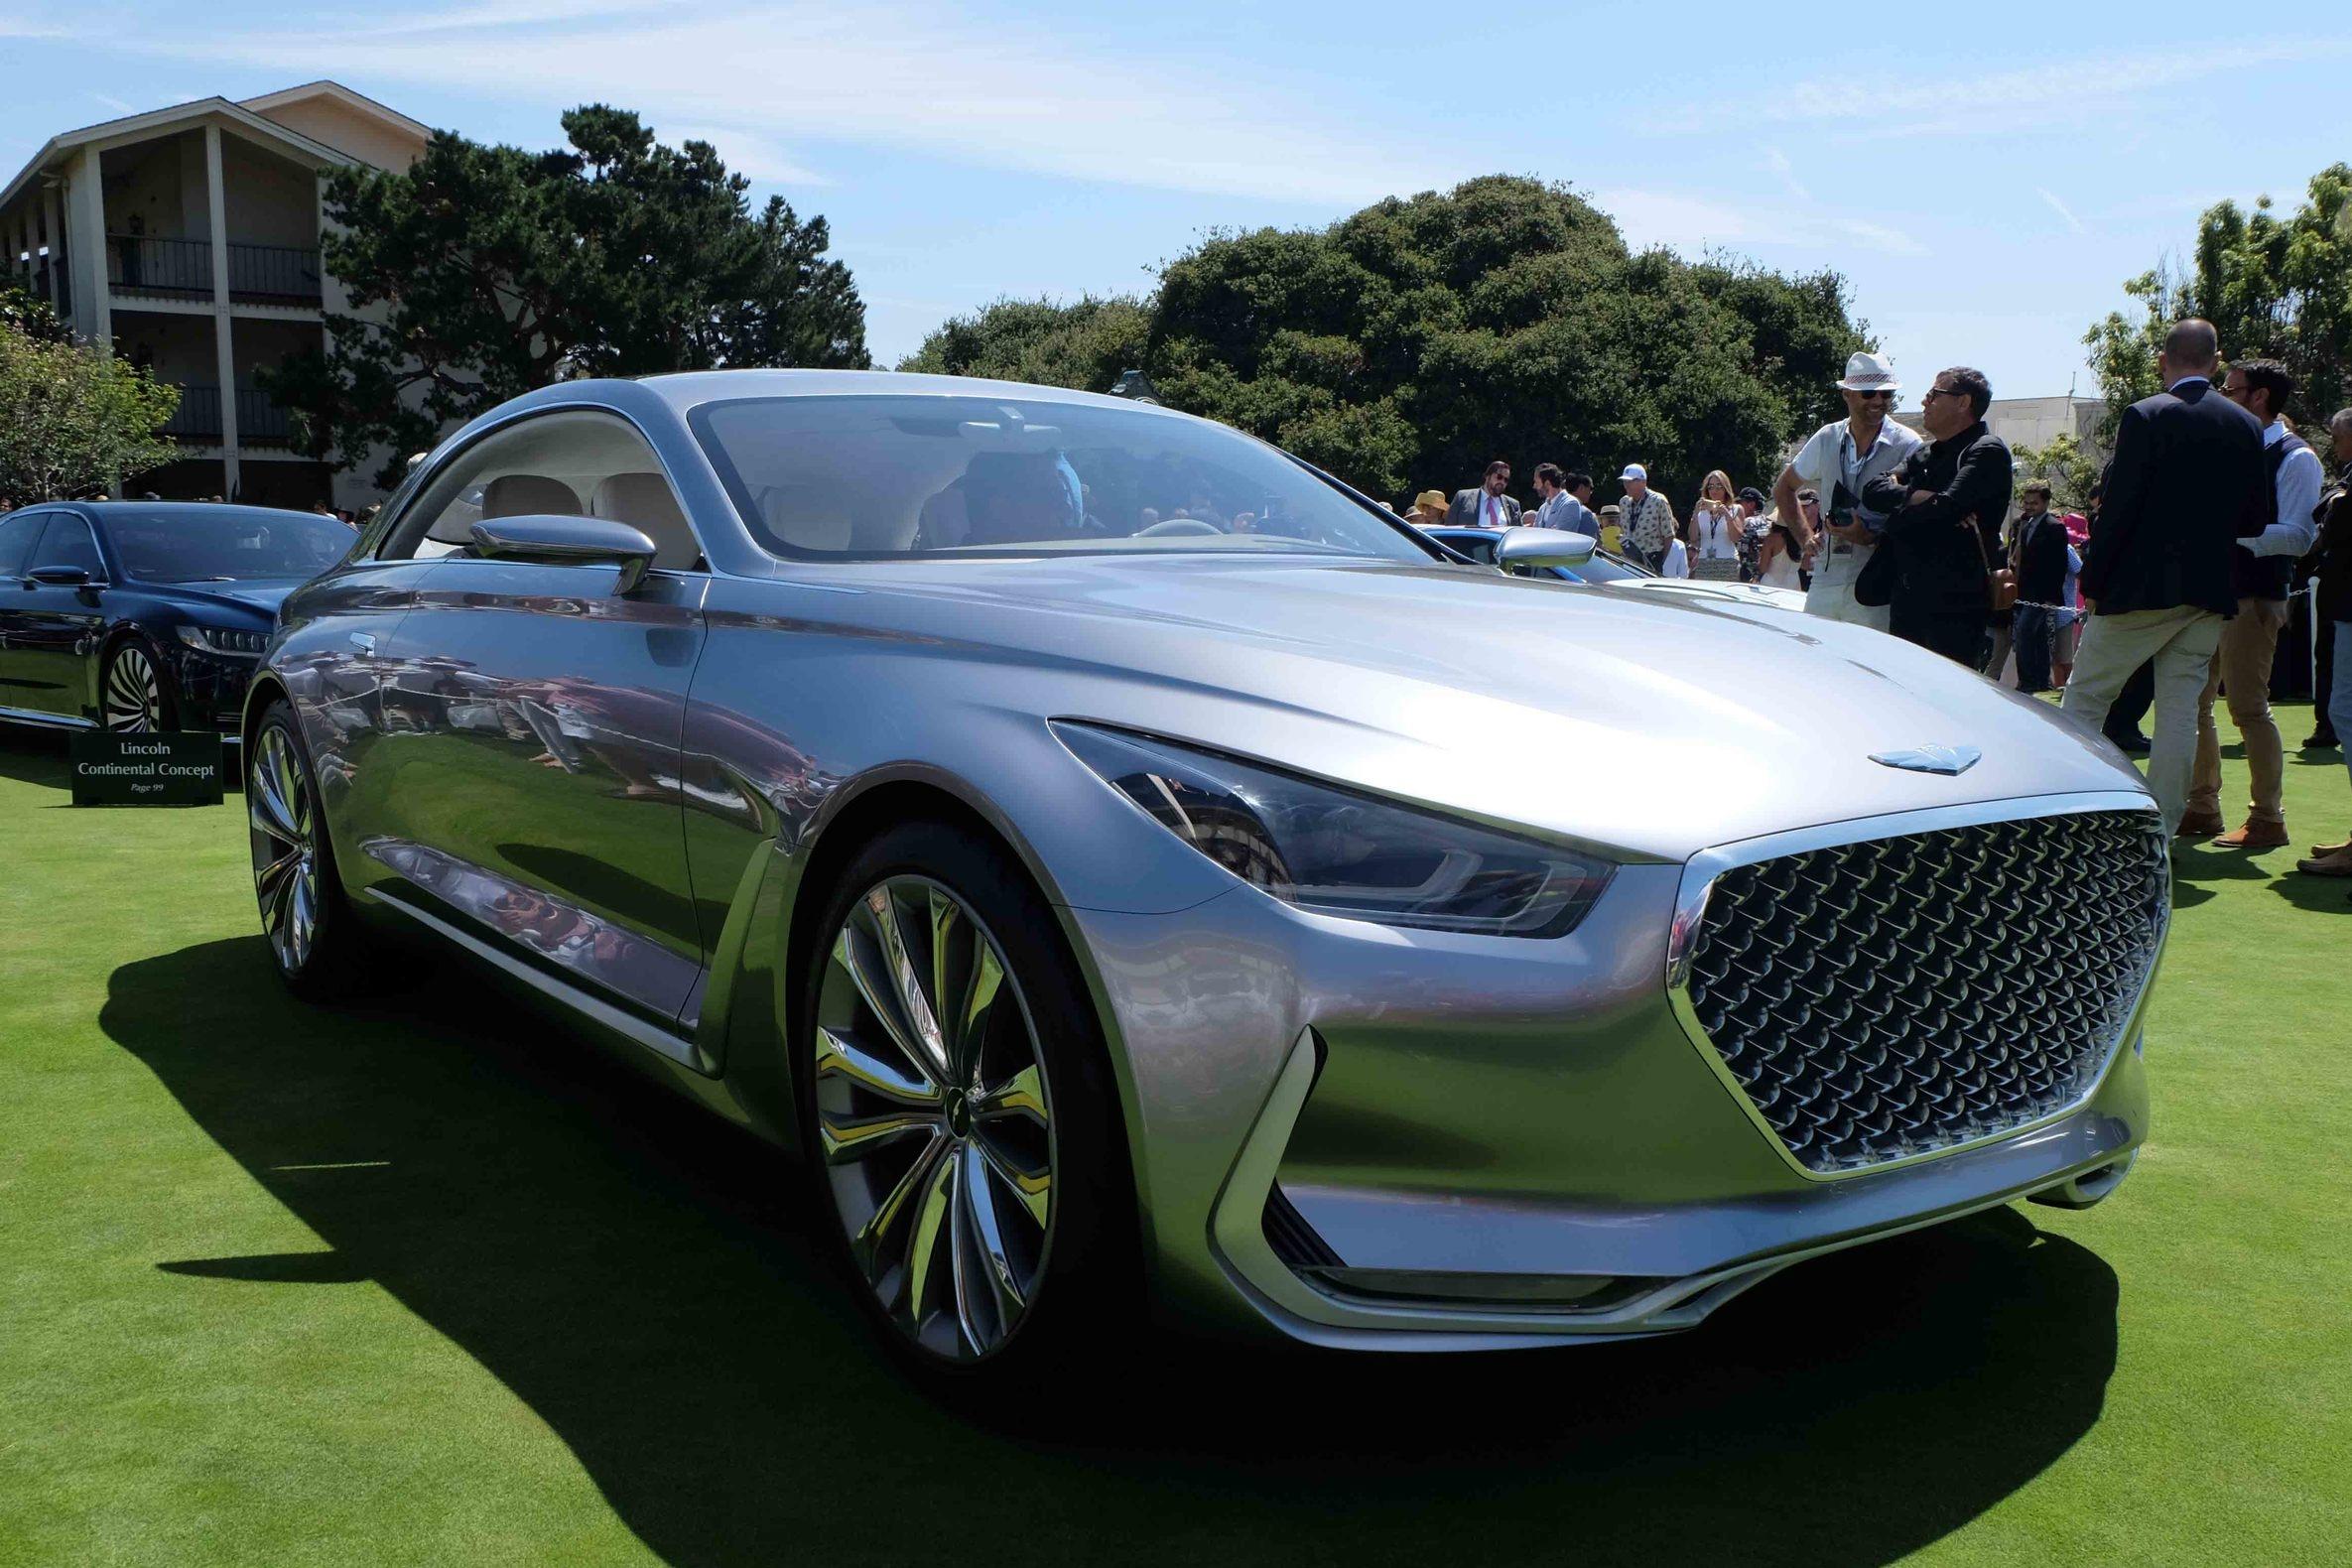 Hyundai Vision G Coupe Concept (2015)